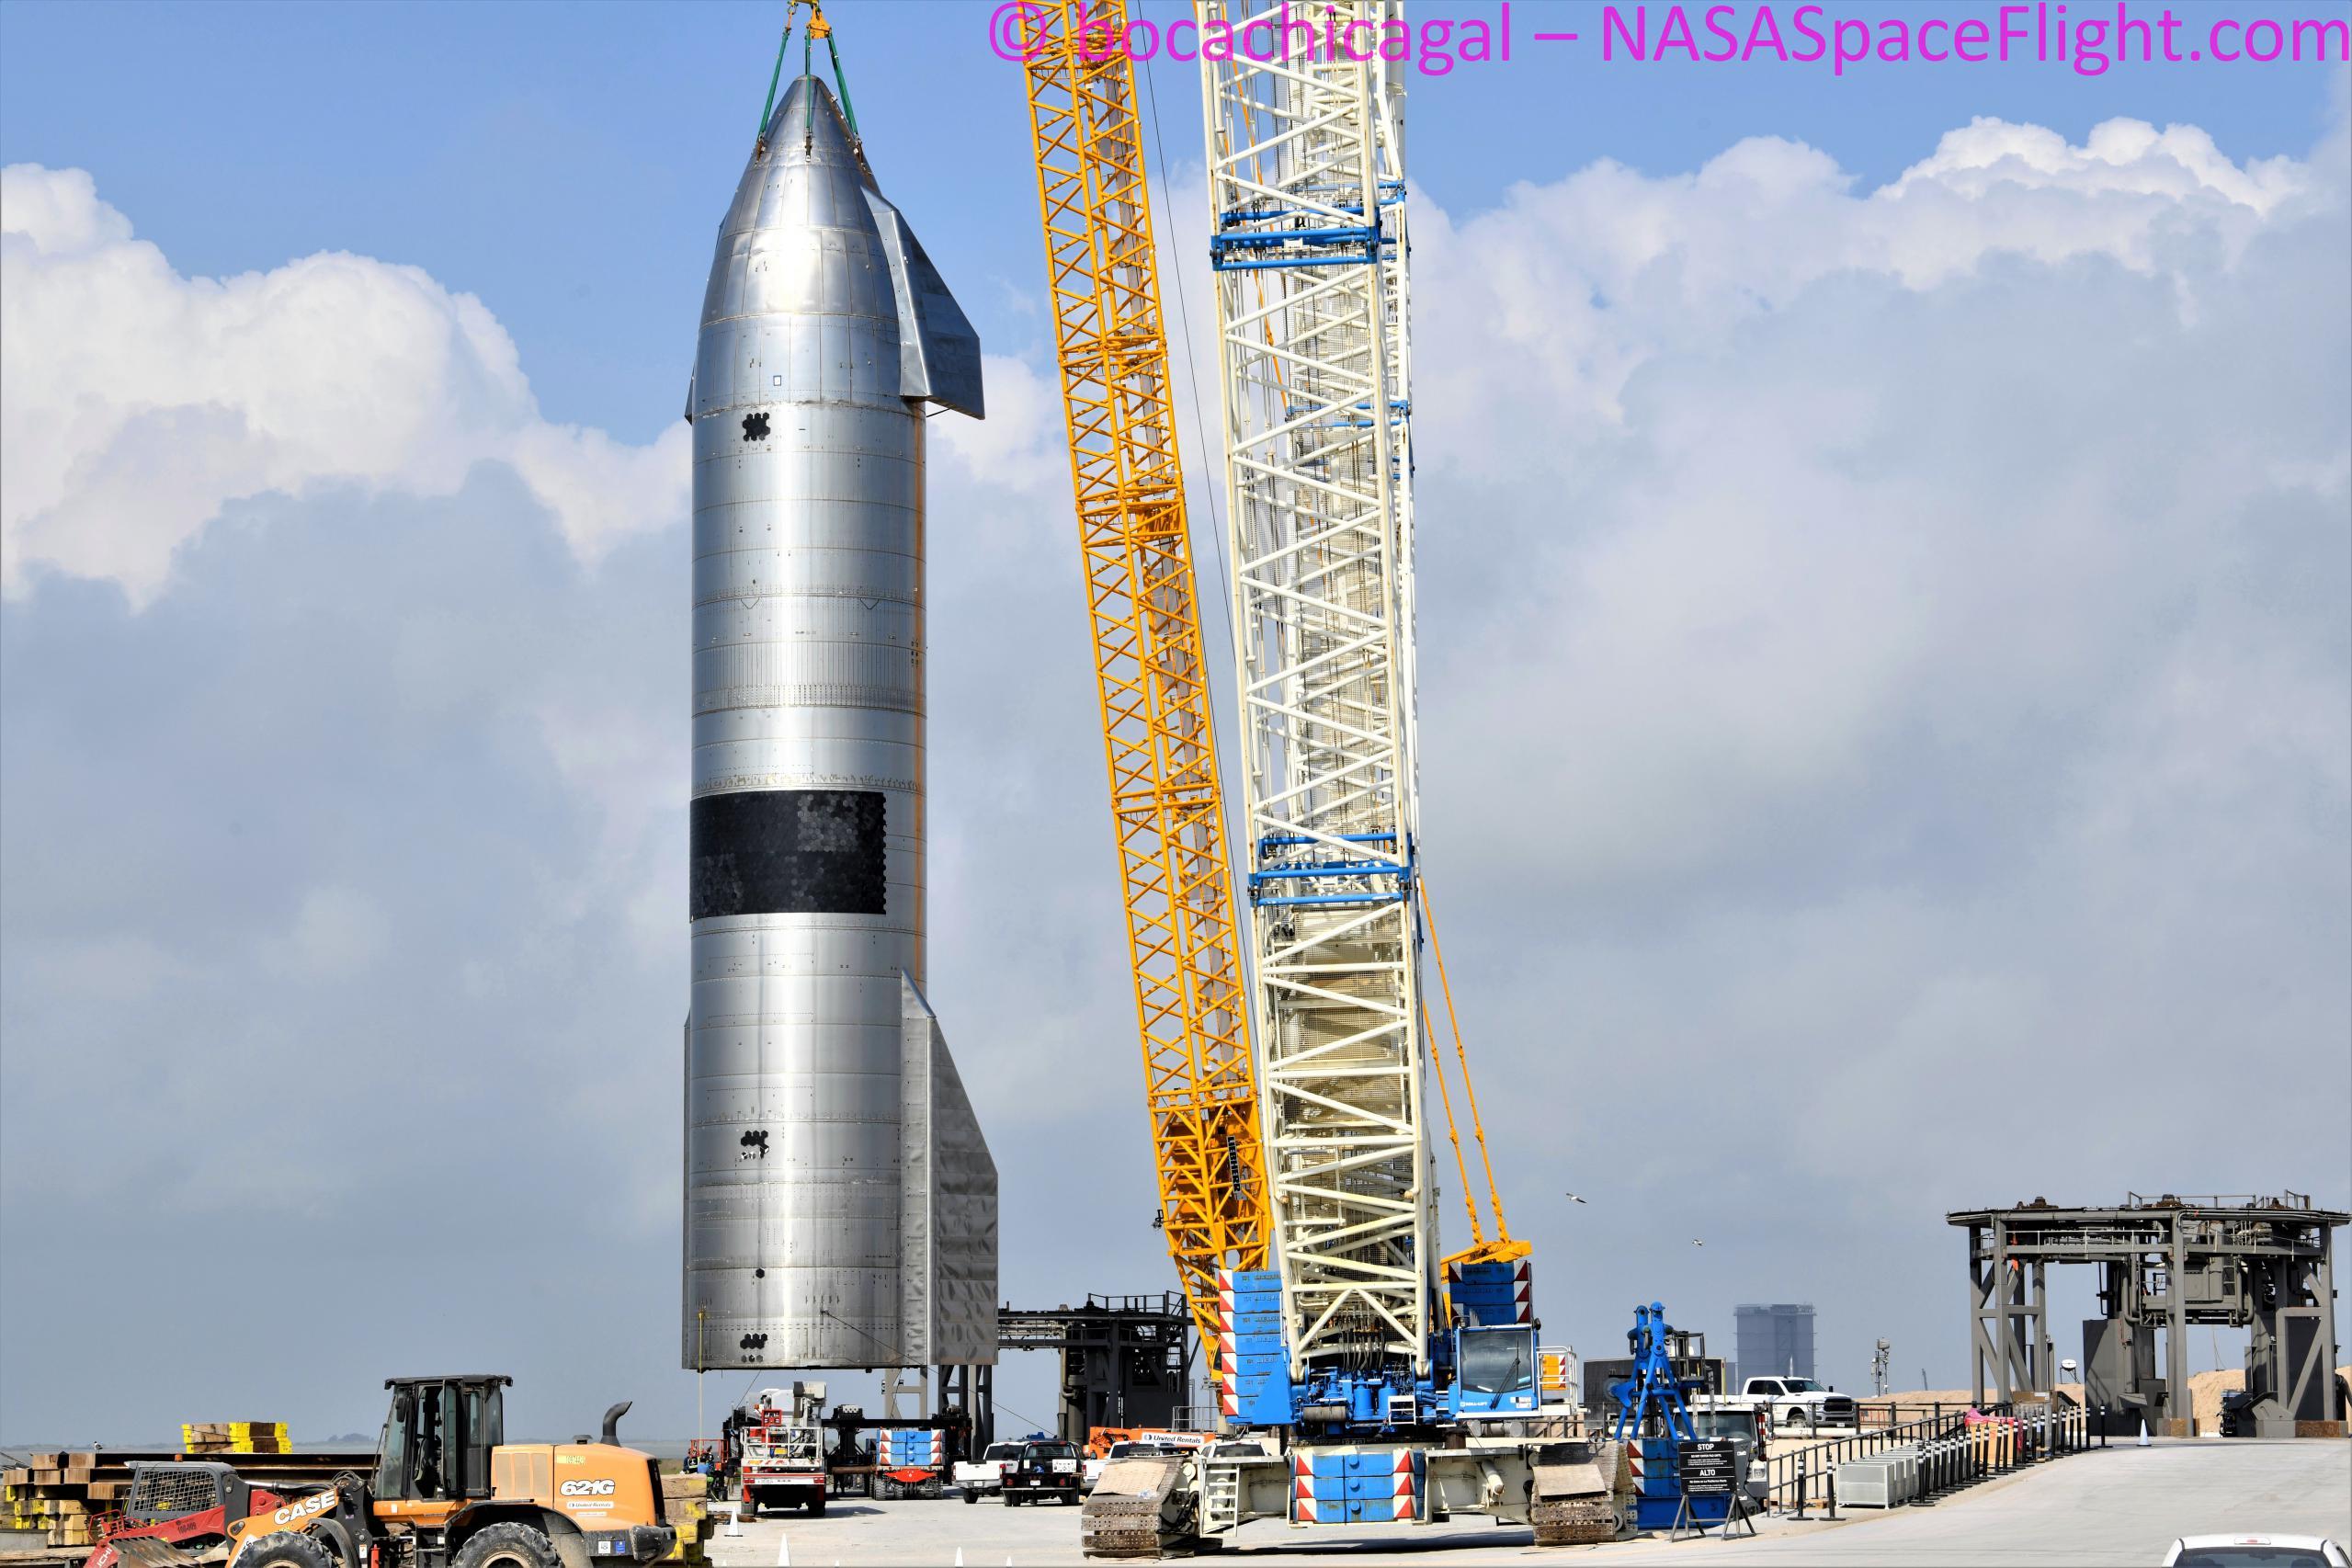 Starship Boca Chica 052621 (NASASpaceflight – bocachicagal) SN15 retirement 2 (c)